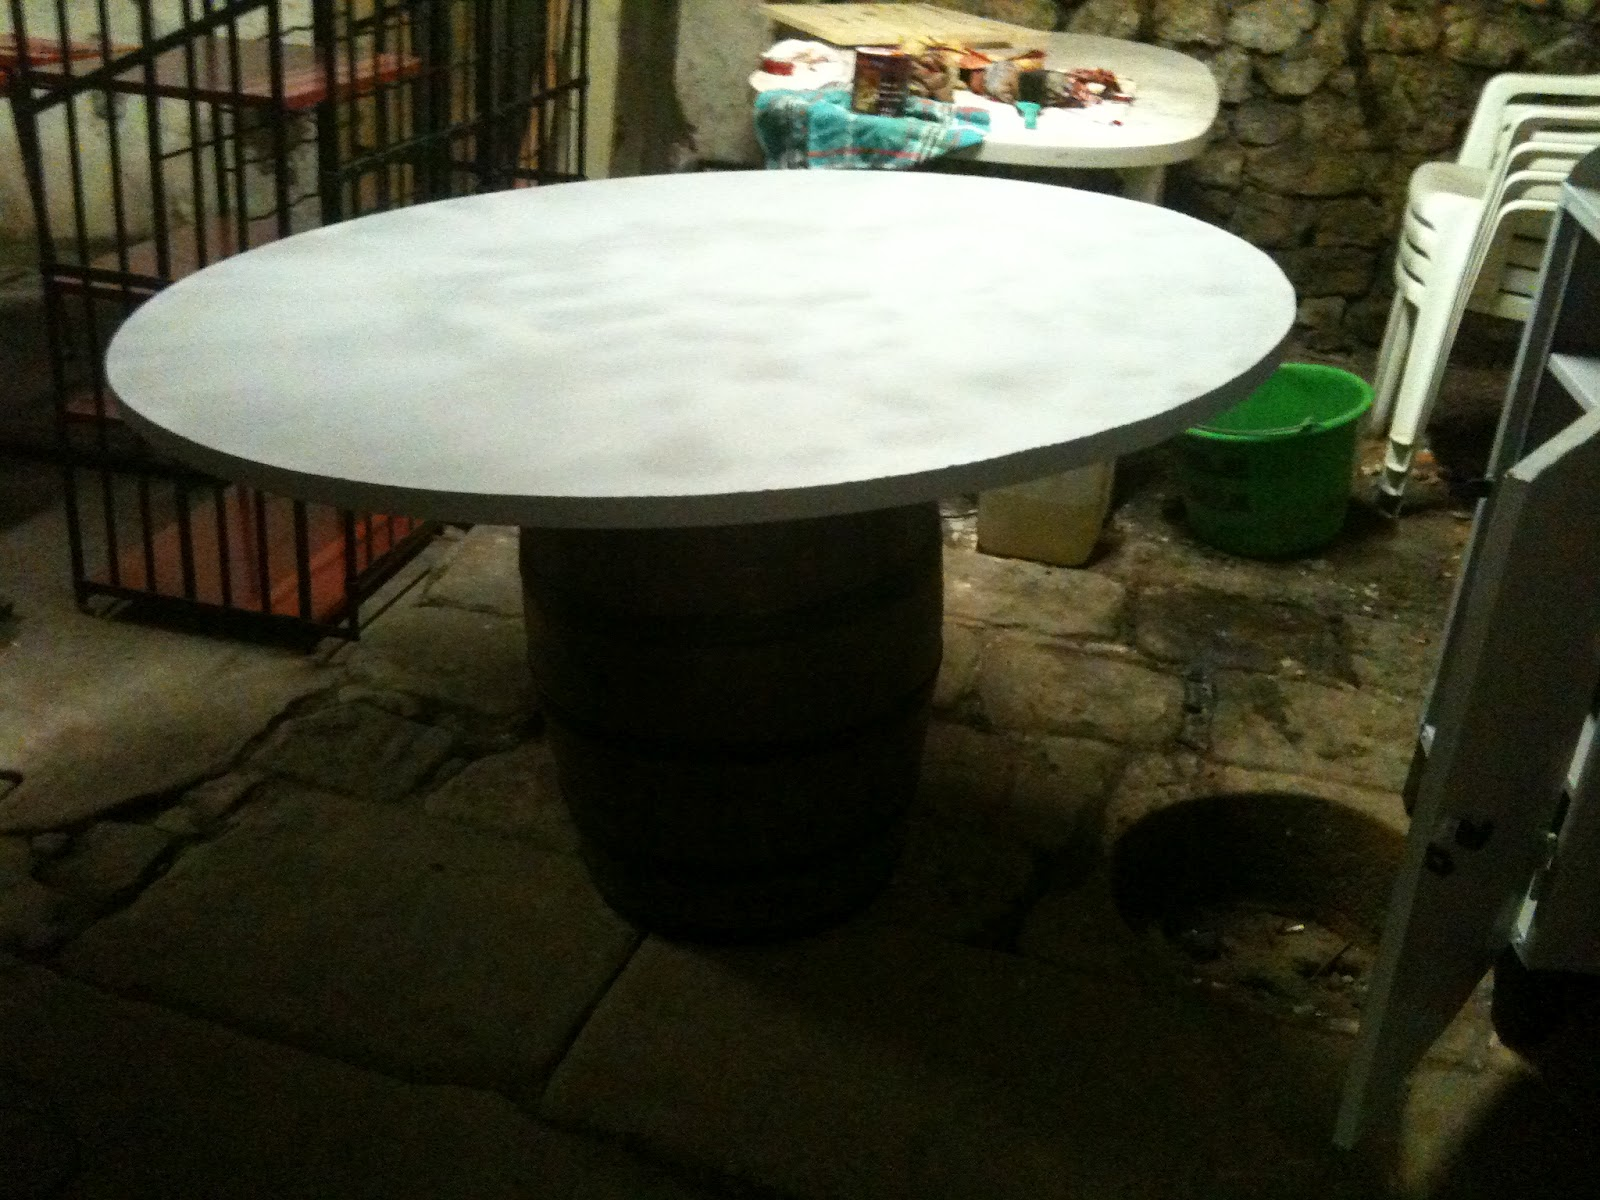 construire retaper a table. Black Bedroom Furniture Sets. Home Design Ideas